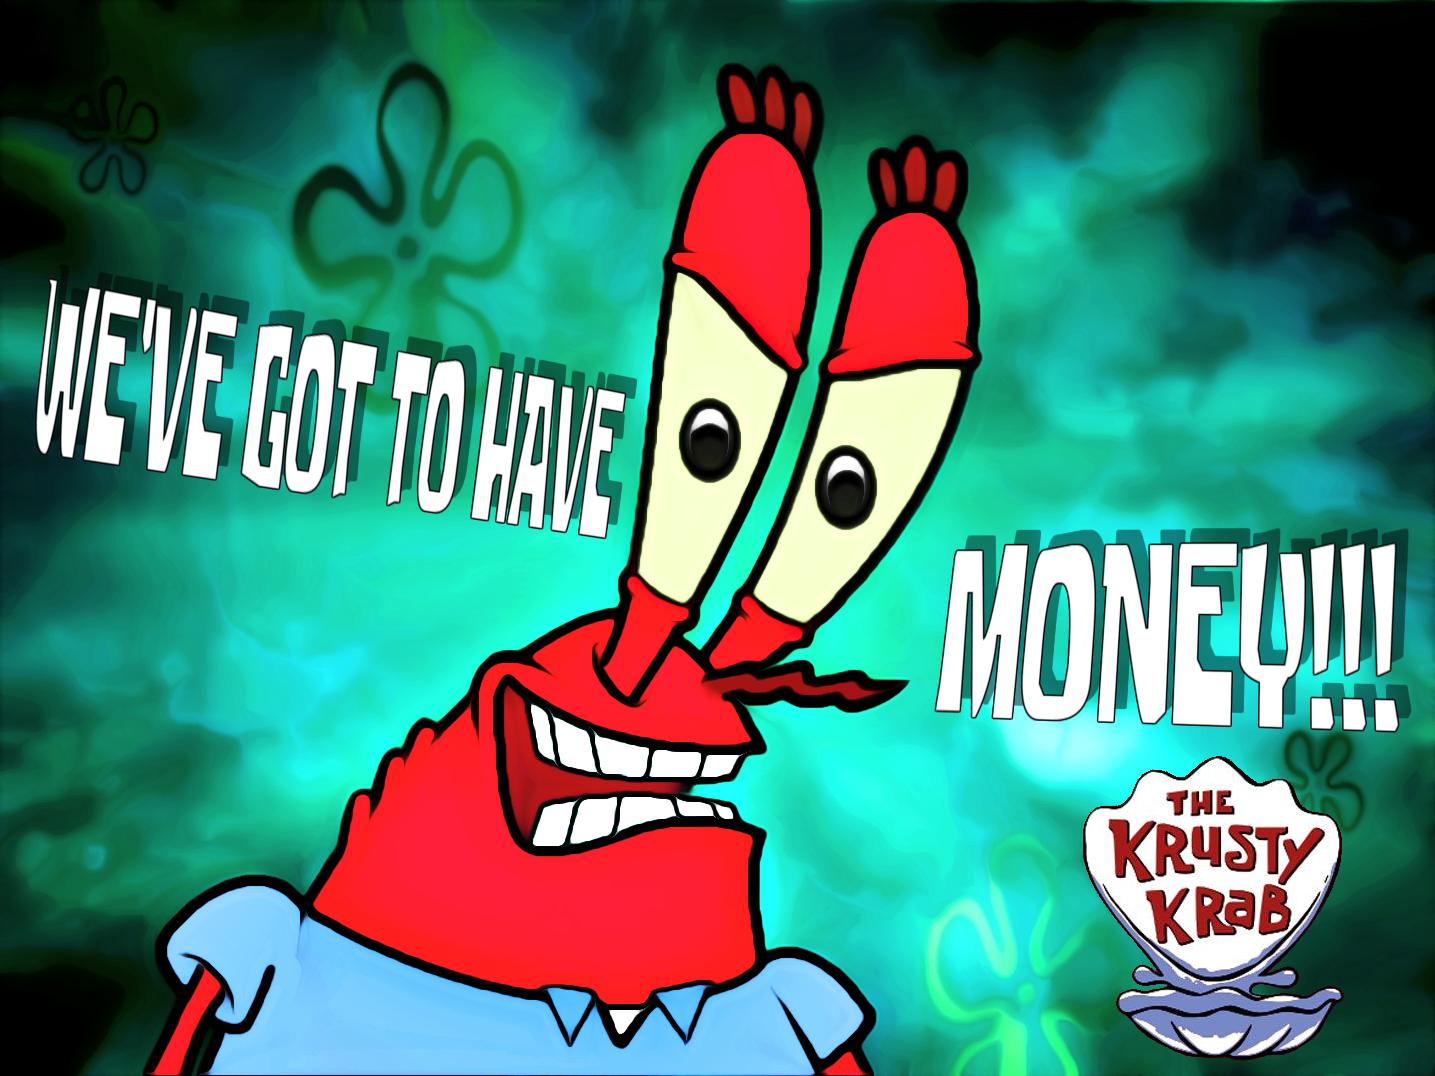 The krust krab mr krabs cartoon text fictional character